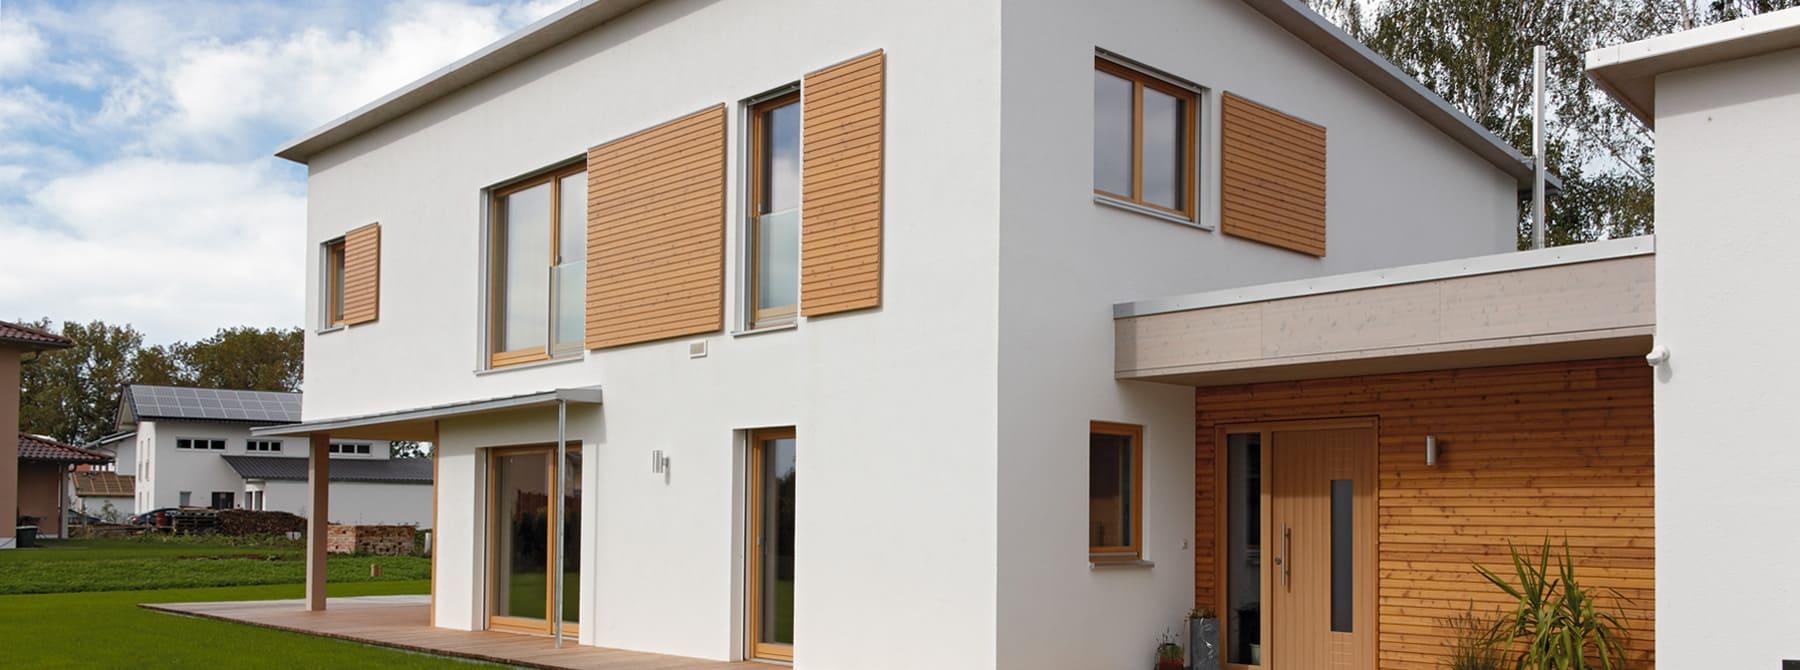 ^ Kundenhaus Dreher - ein Holzhaus im modernen Stil - Sonnleitner.de ...